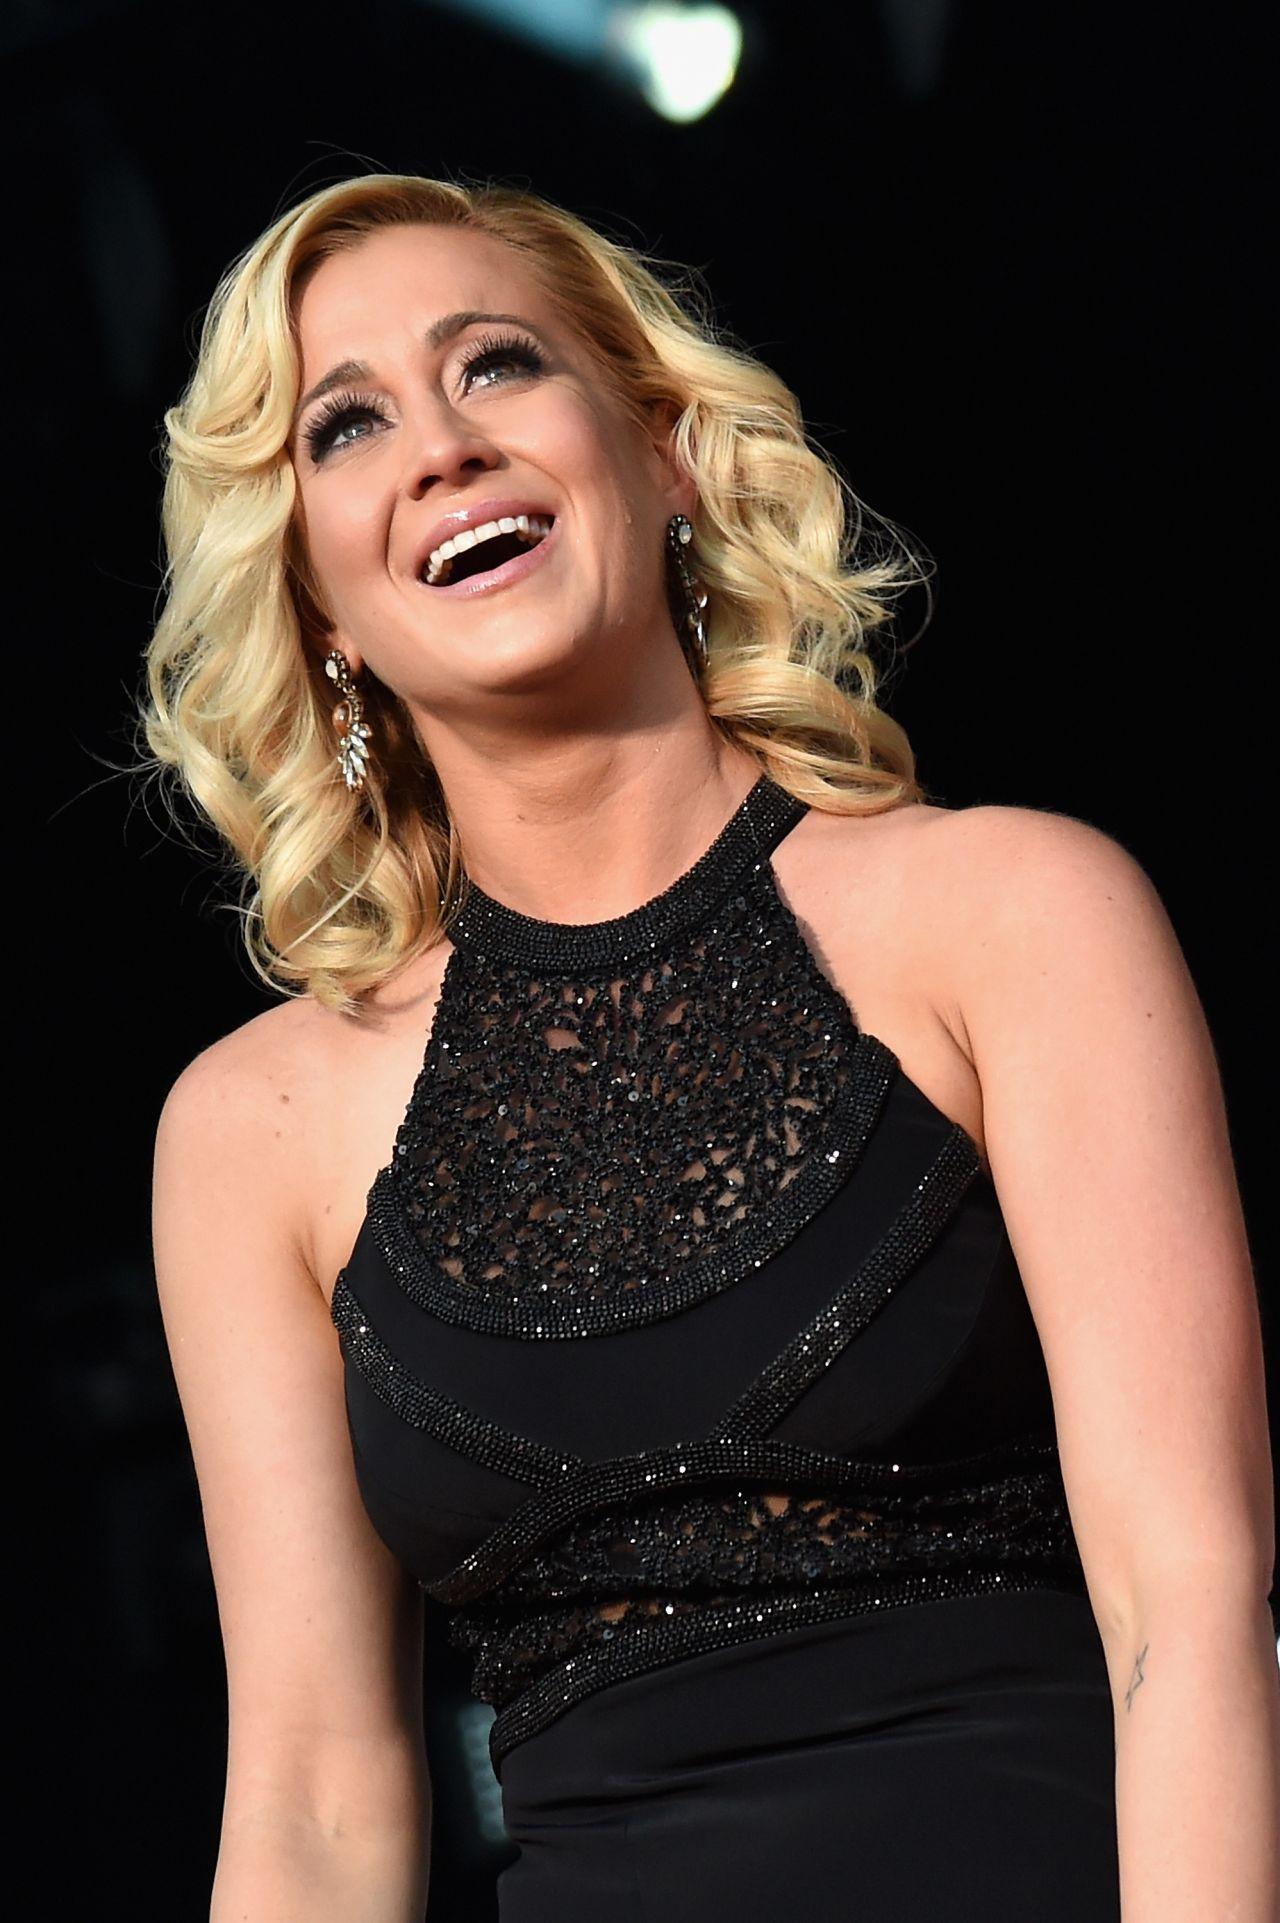 Kellie Pickler Performing At The Cma Festival In Nashville